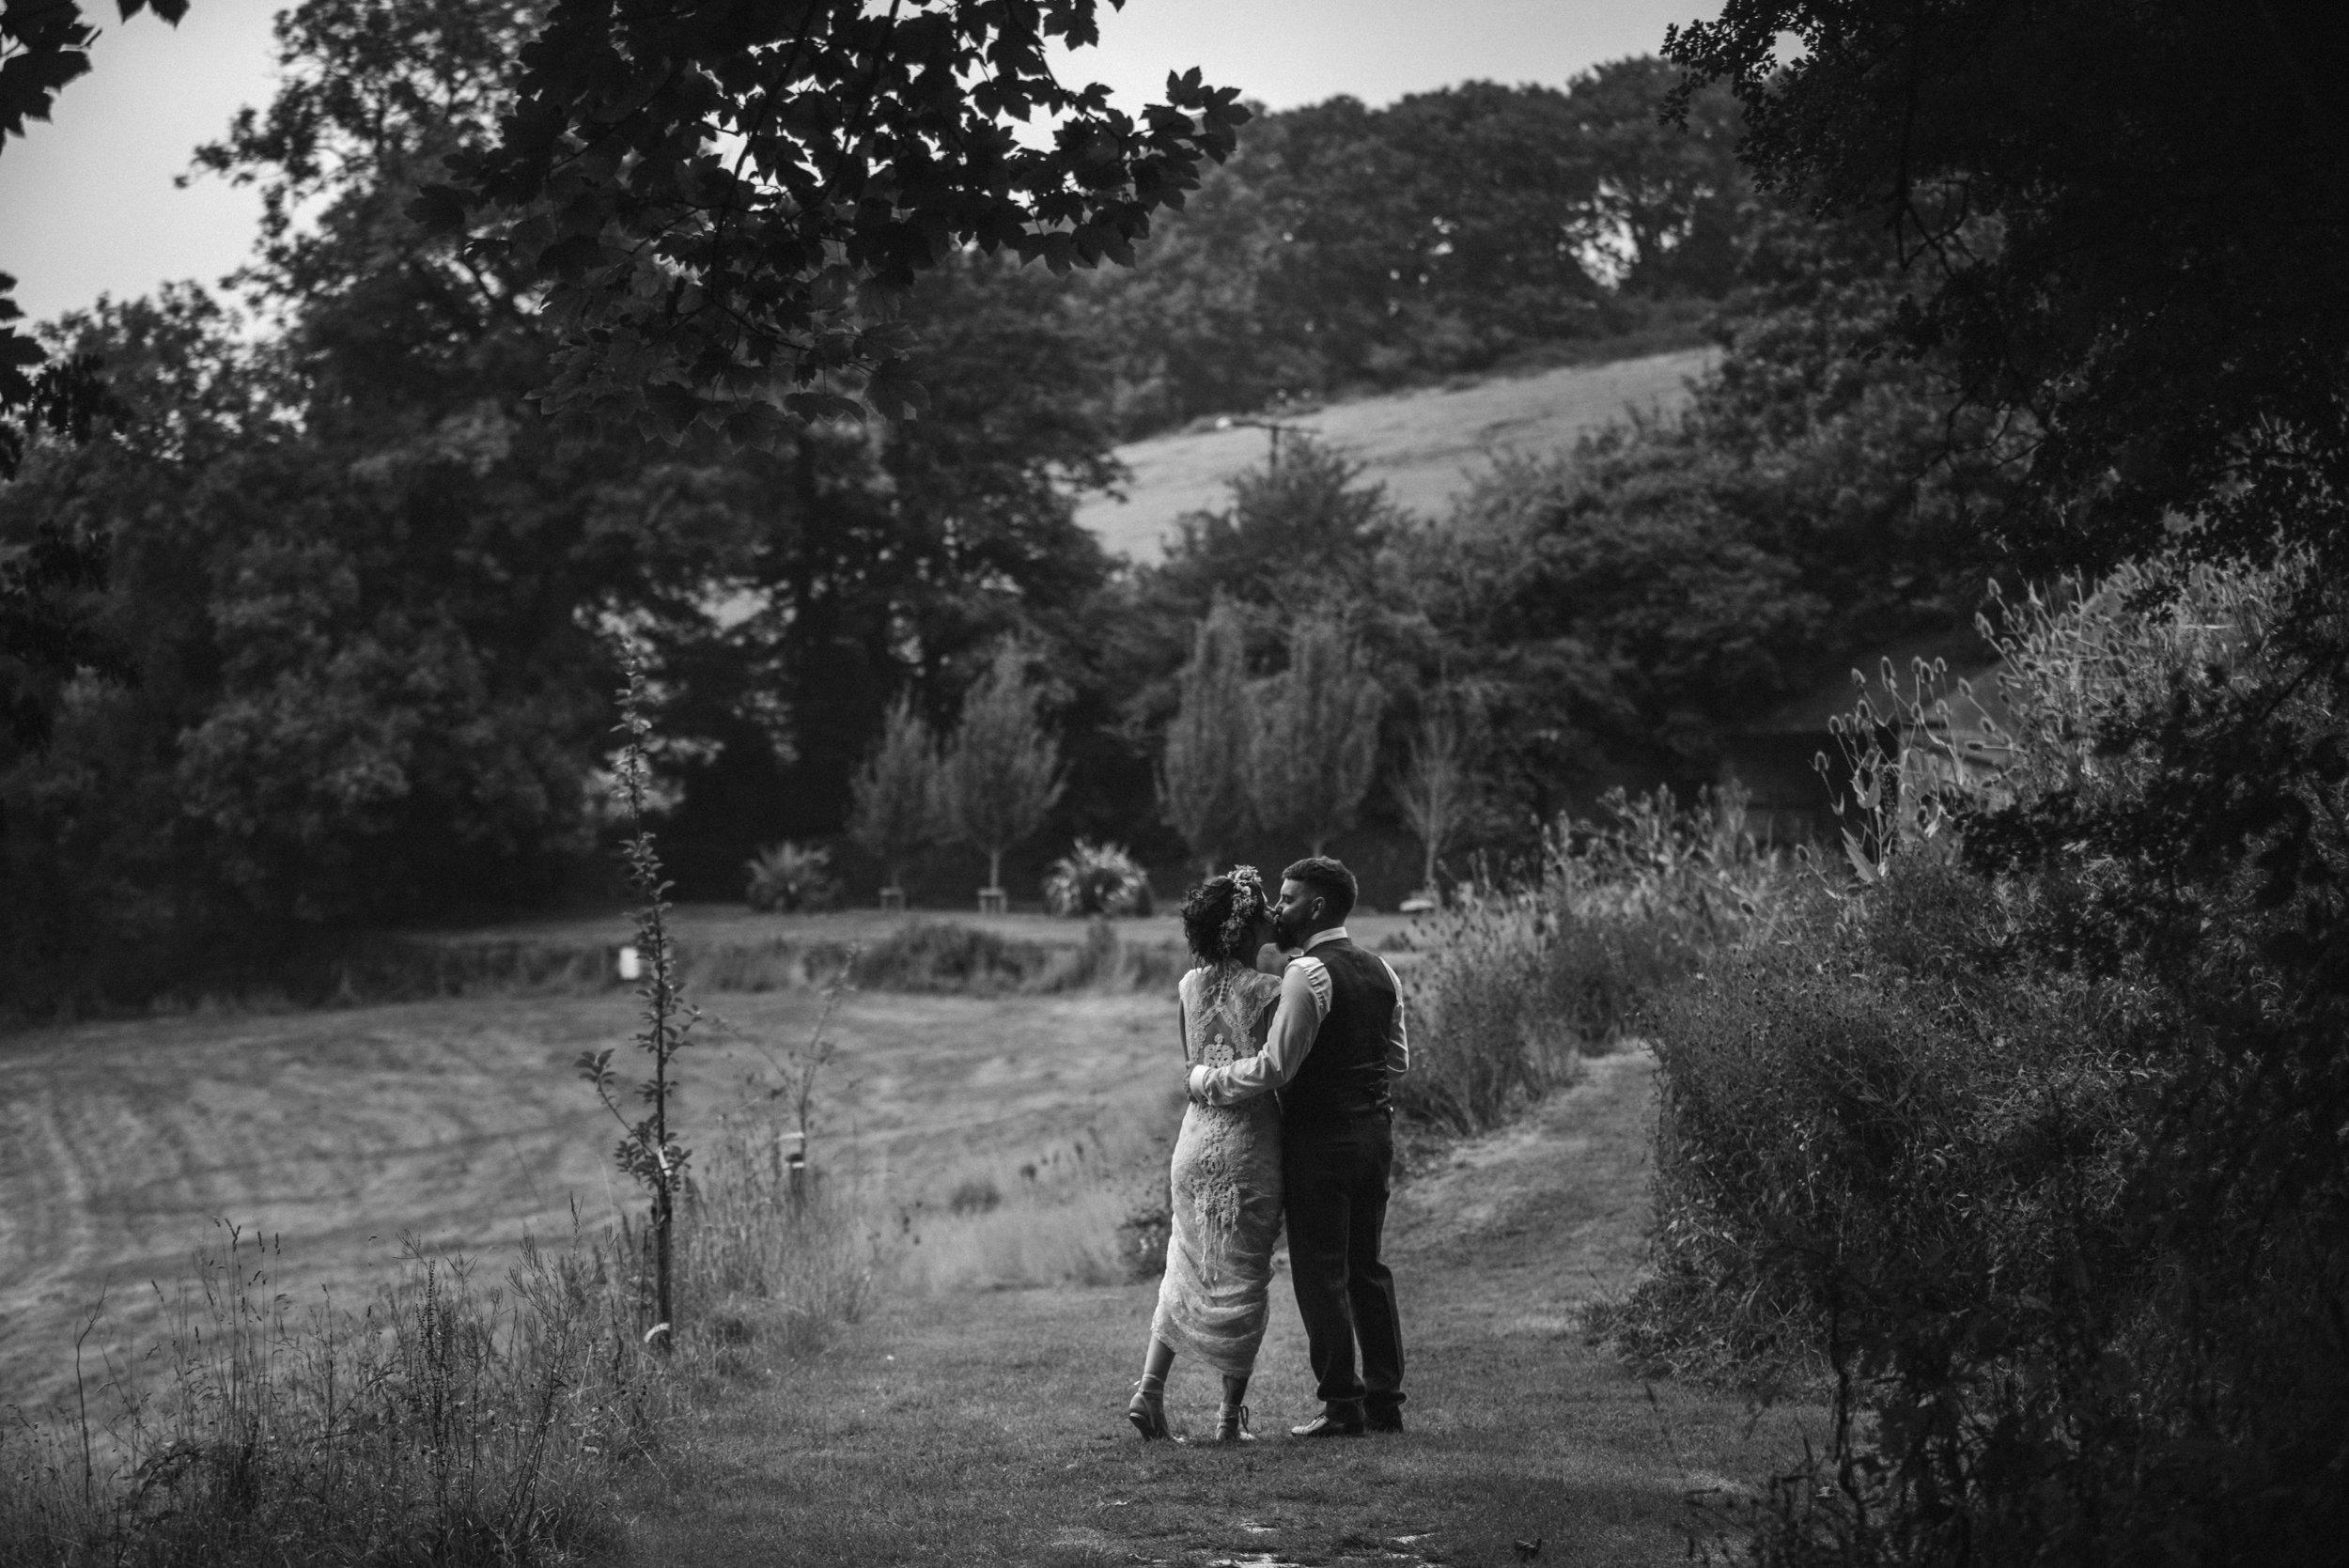 pengenna-manor-wedding-photographer-76.jpg